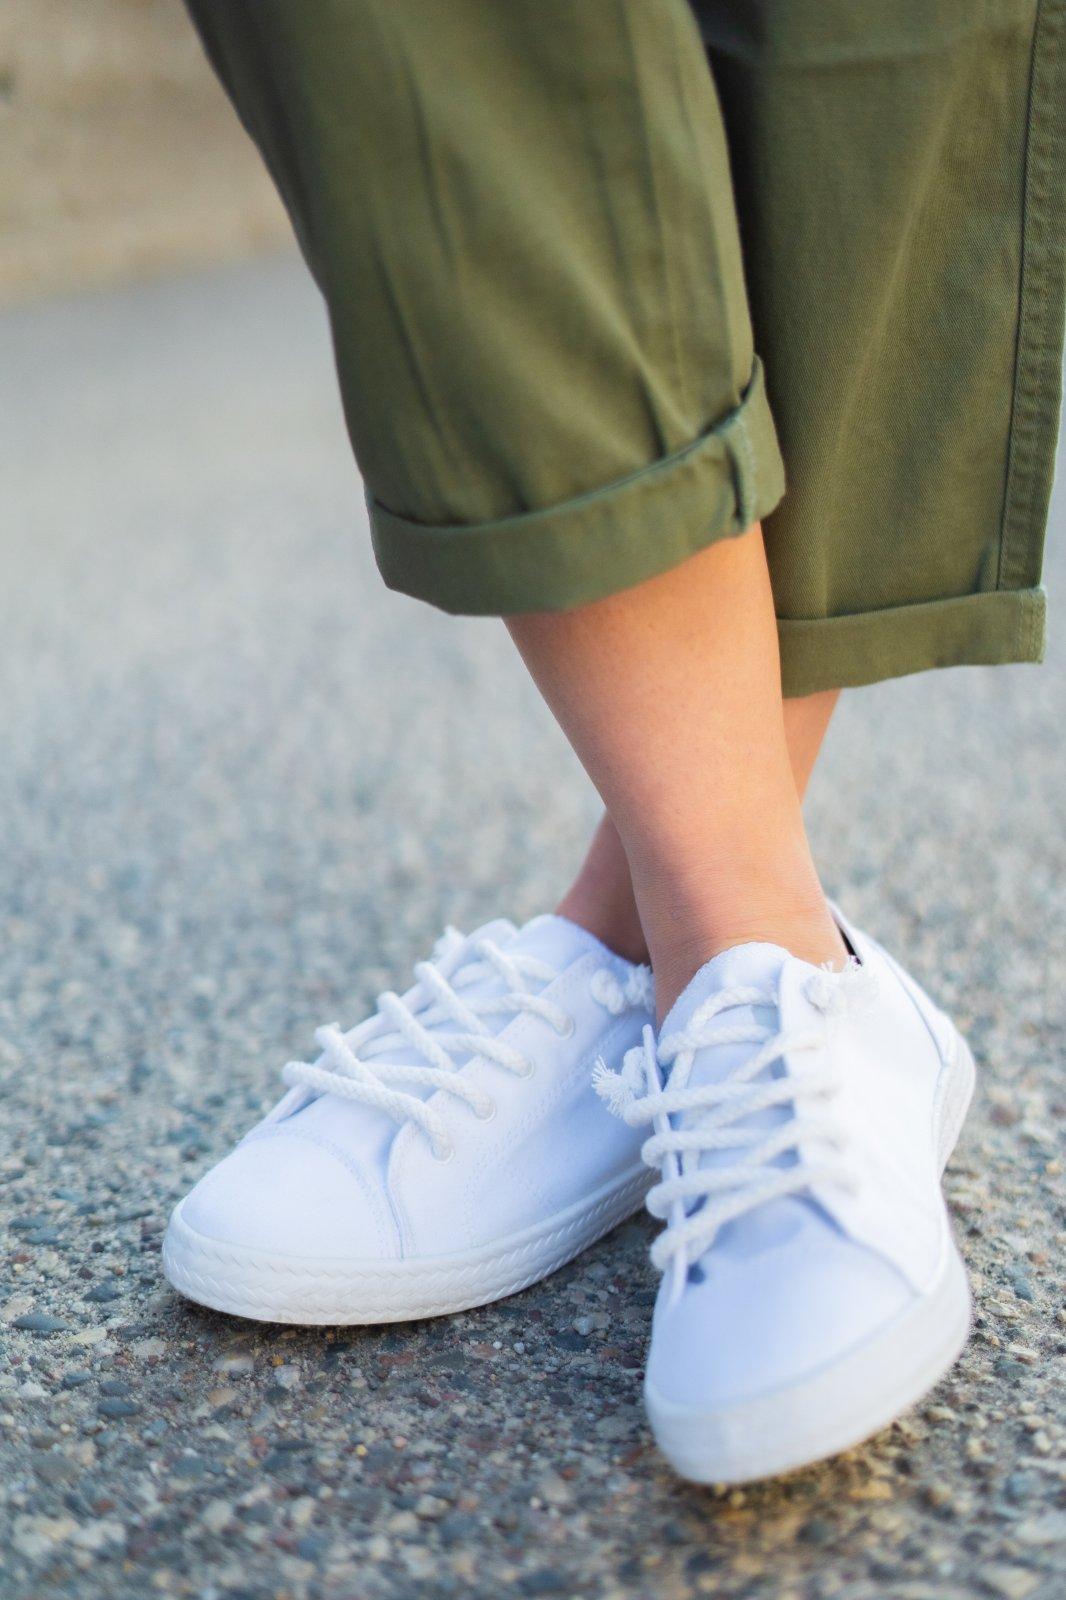 Billabong Marina White Lace Up Shoe